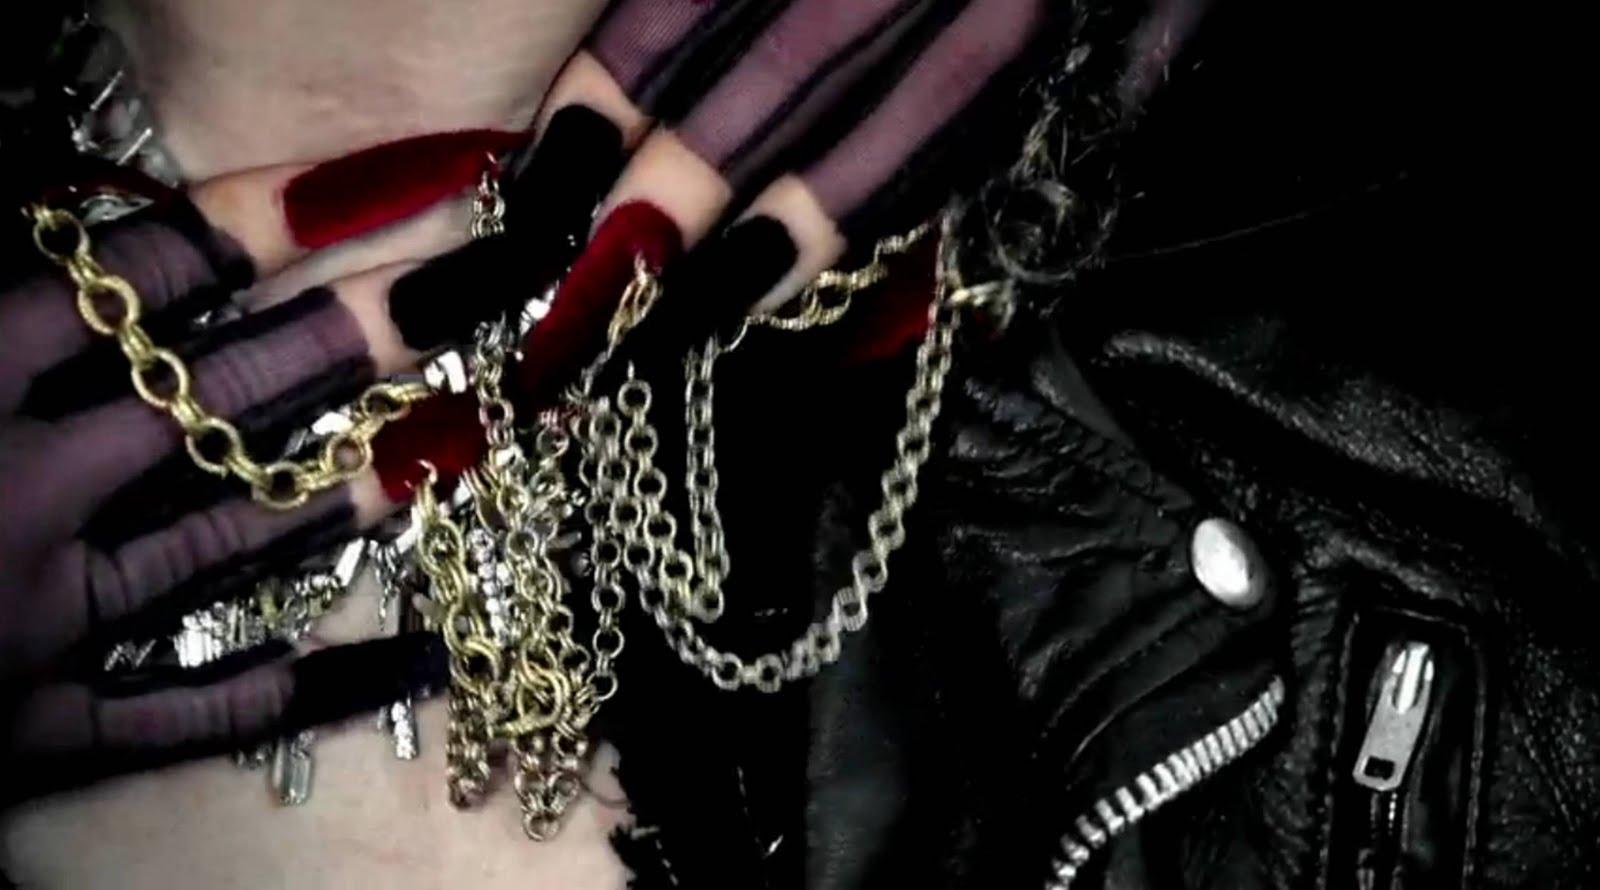 http://4.bp.blogspot.com/-l4tPutyiERs/TeHqZnWJvlI/AAAAAAAAAQ4/3Sl0vcrEFUc/s1600/Gaga+JUDAS+3.jpg